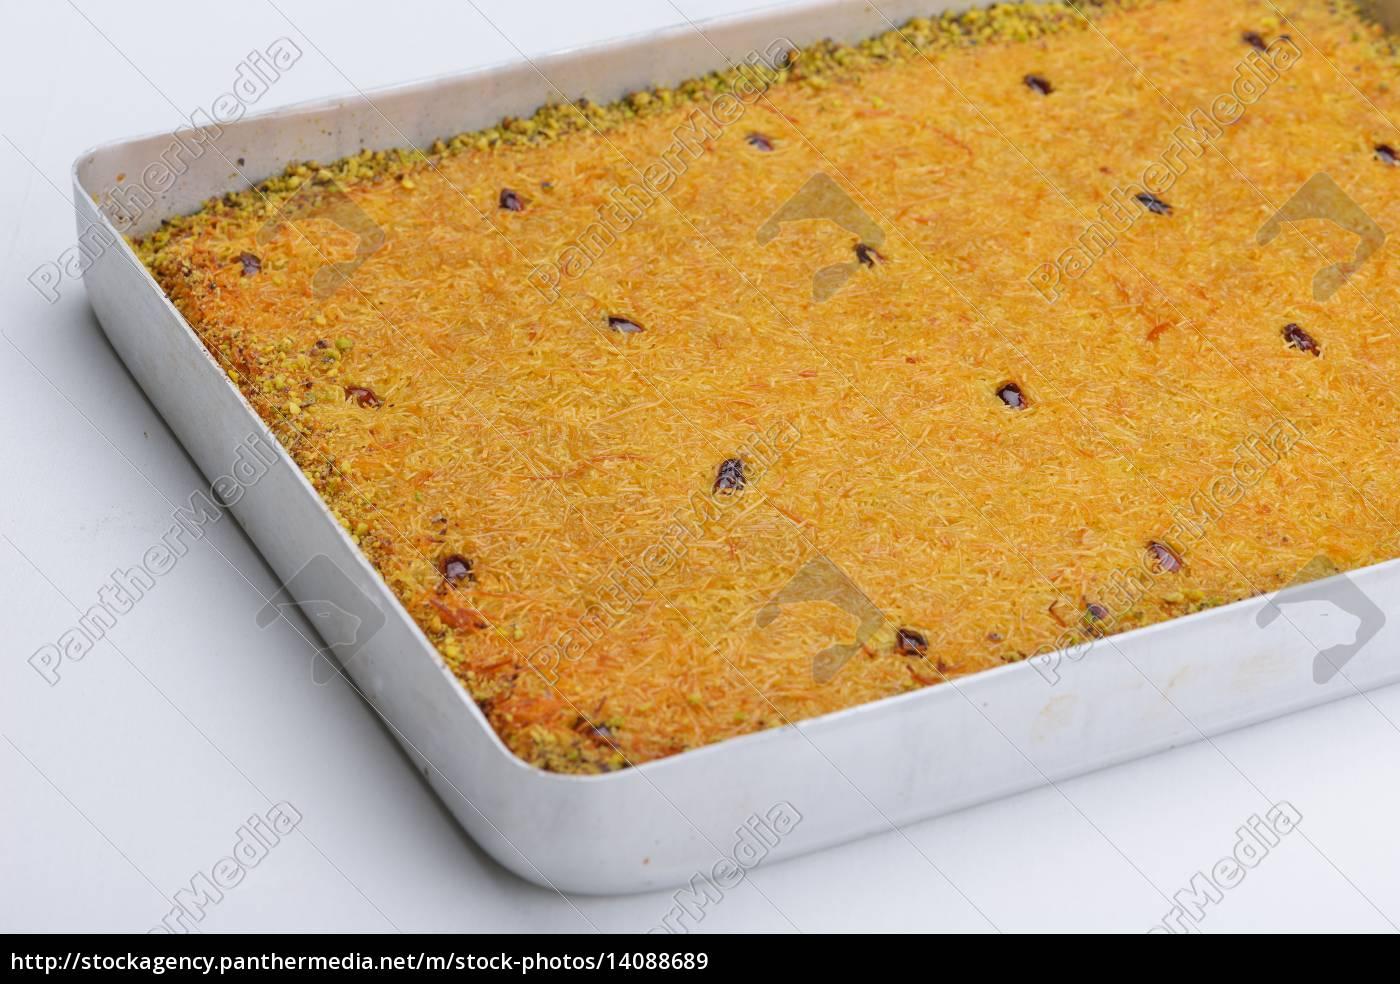 turkish, pastry, kadaif - 14088689